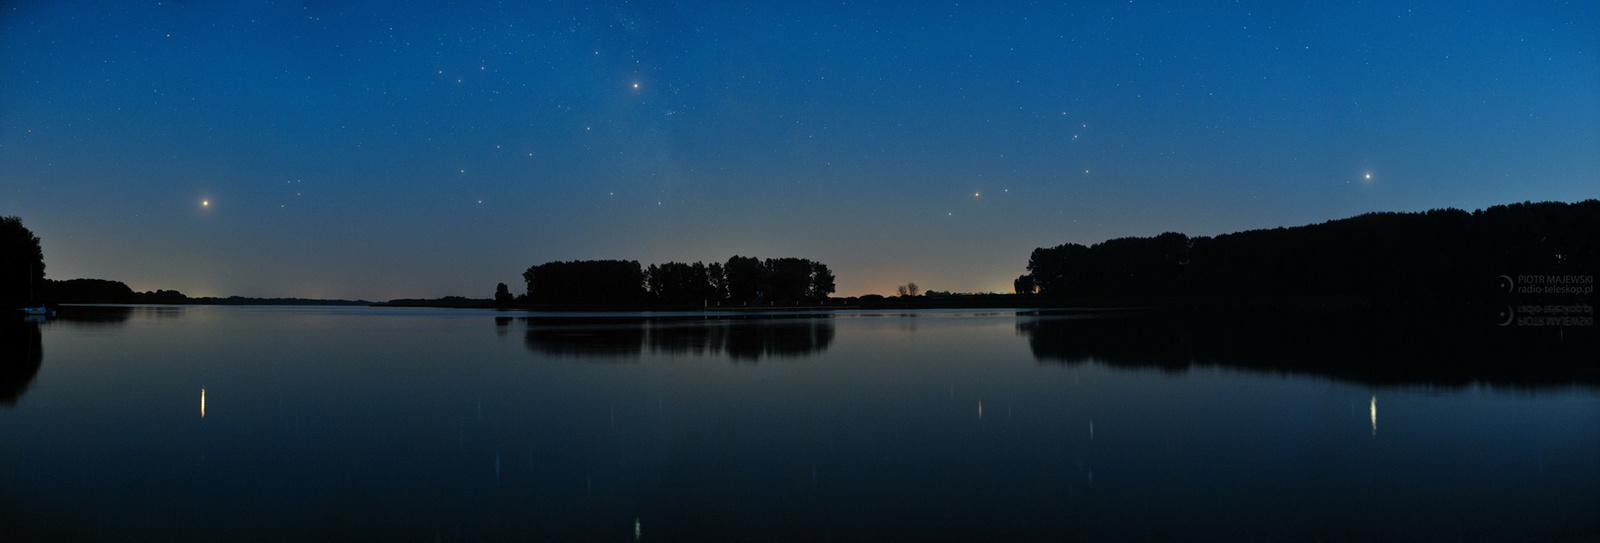 2018-08-01_Evening_planets_panorama_Goplo_lake_web_a.jpg